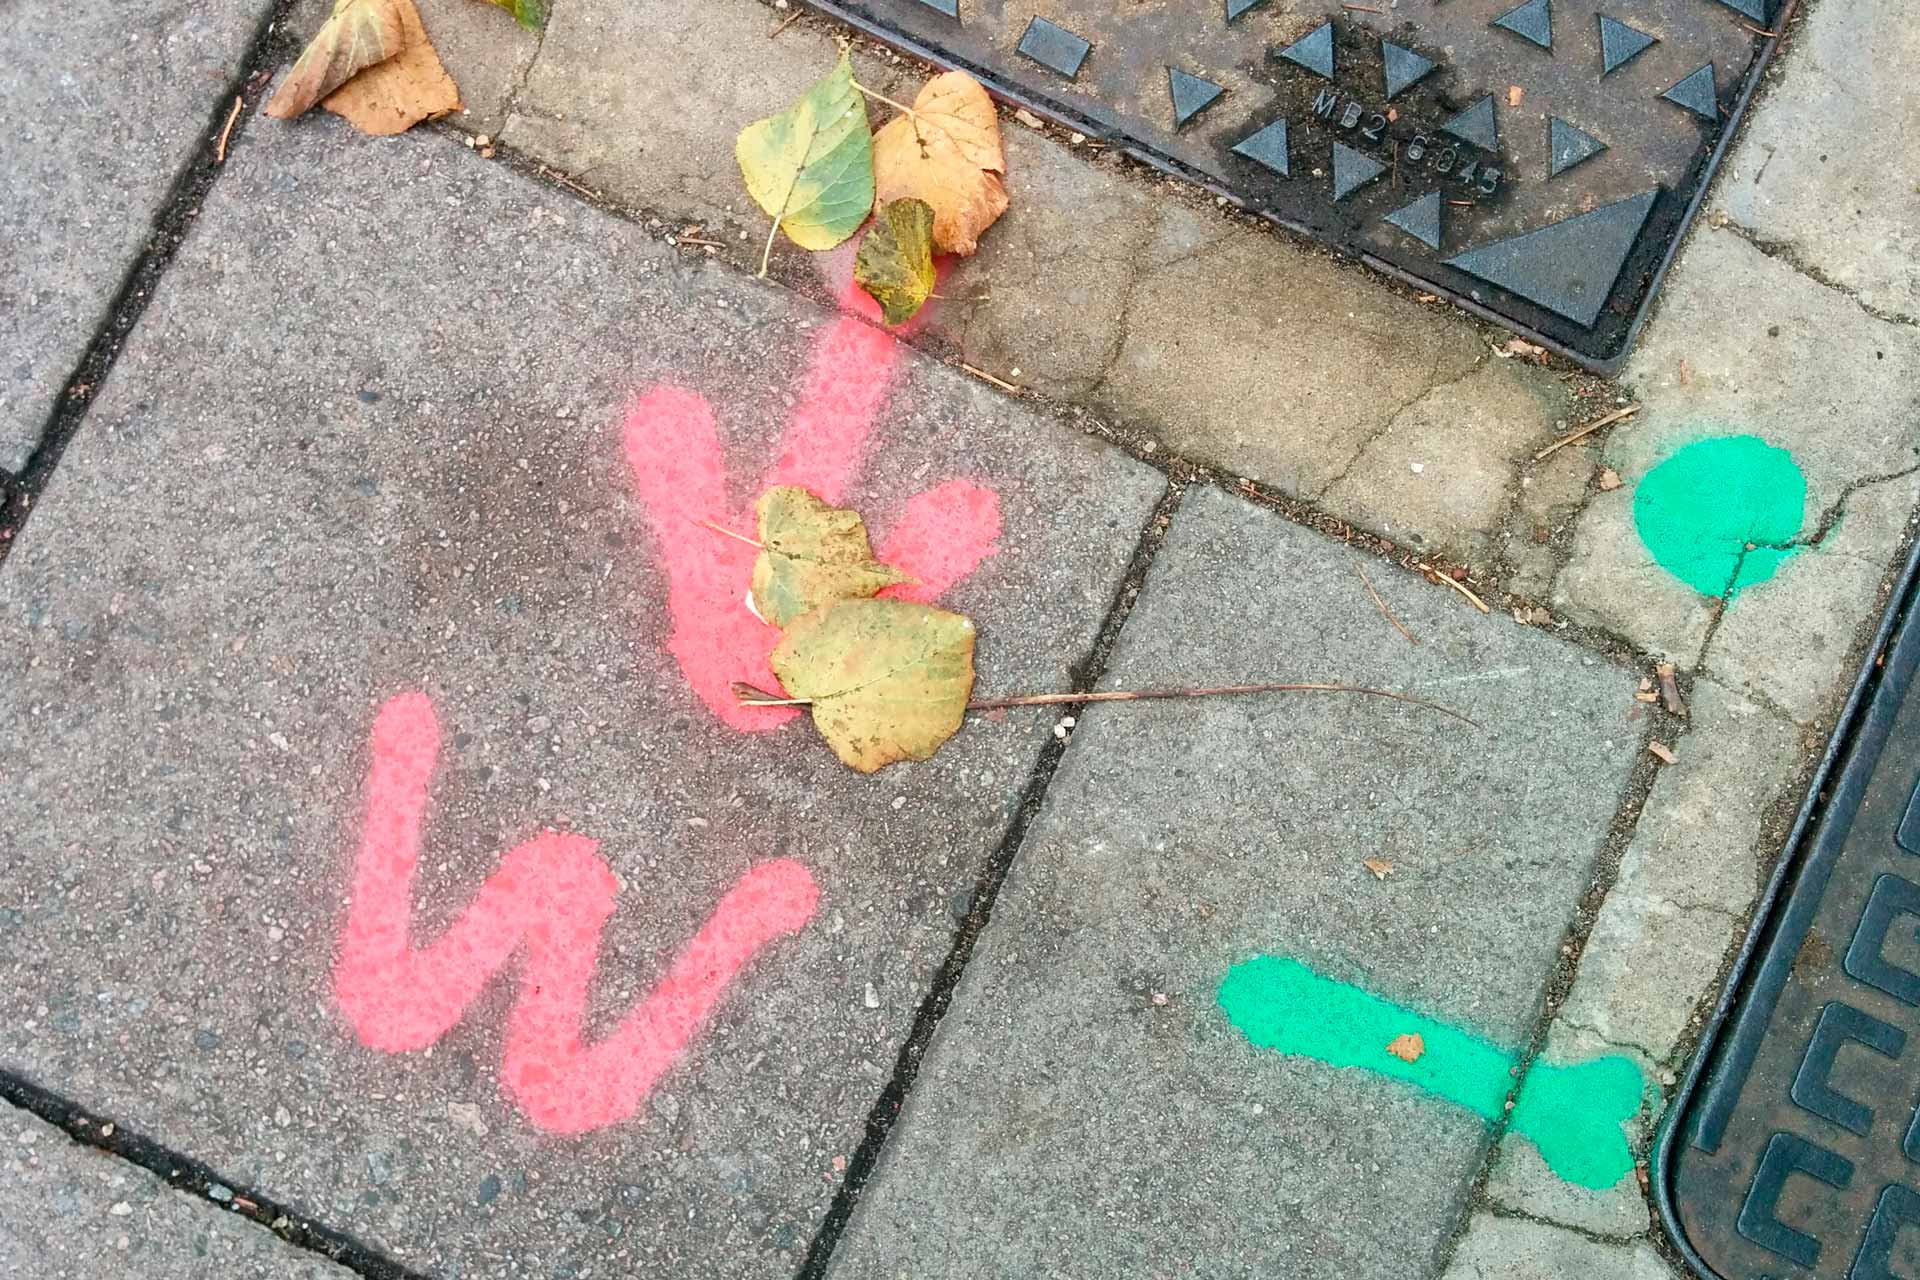 Street-markings_image04